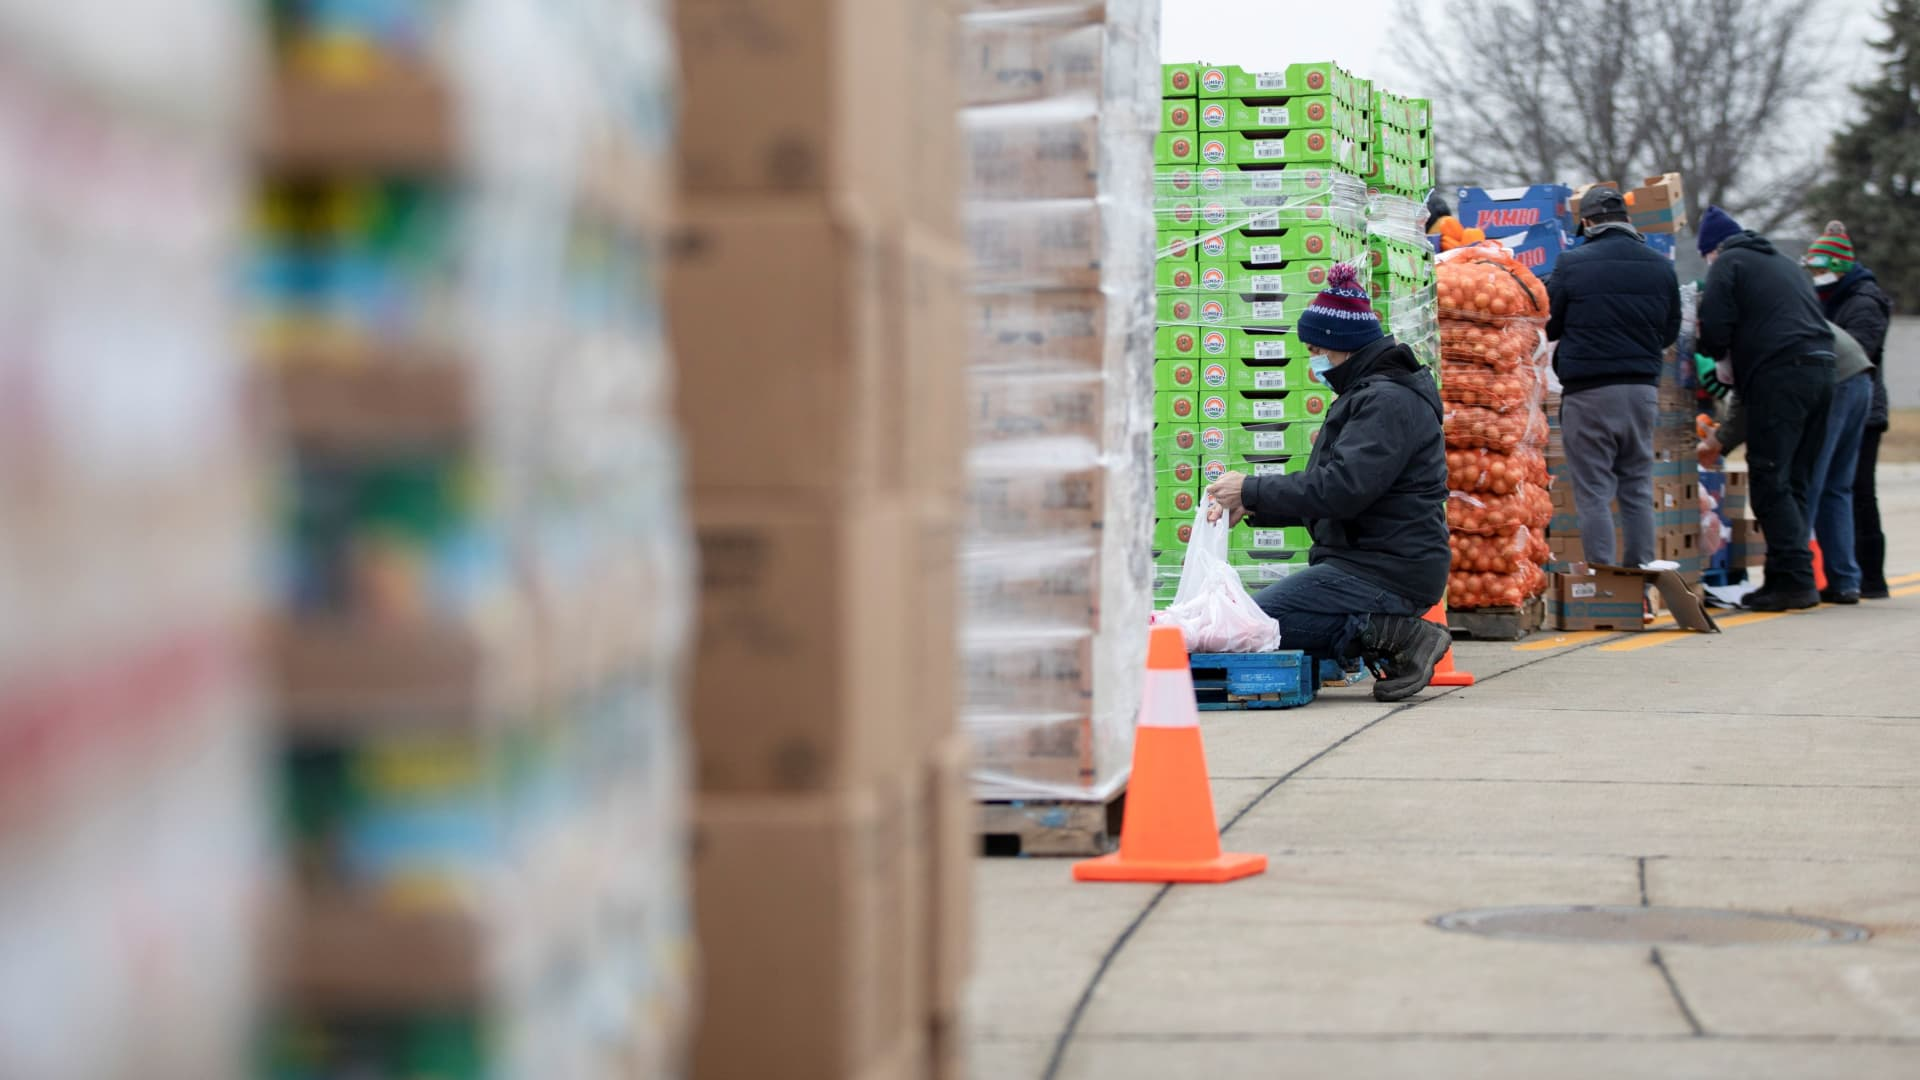 Volunteers from Forgotten Harvest food bank help sort goods to distribute during a mobile food pantry ahead of Christmas, amid the coronavirus disease (COVID-19) pandemic in Warren, Michigan, U.S., December 21, 2020.